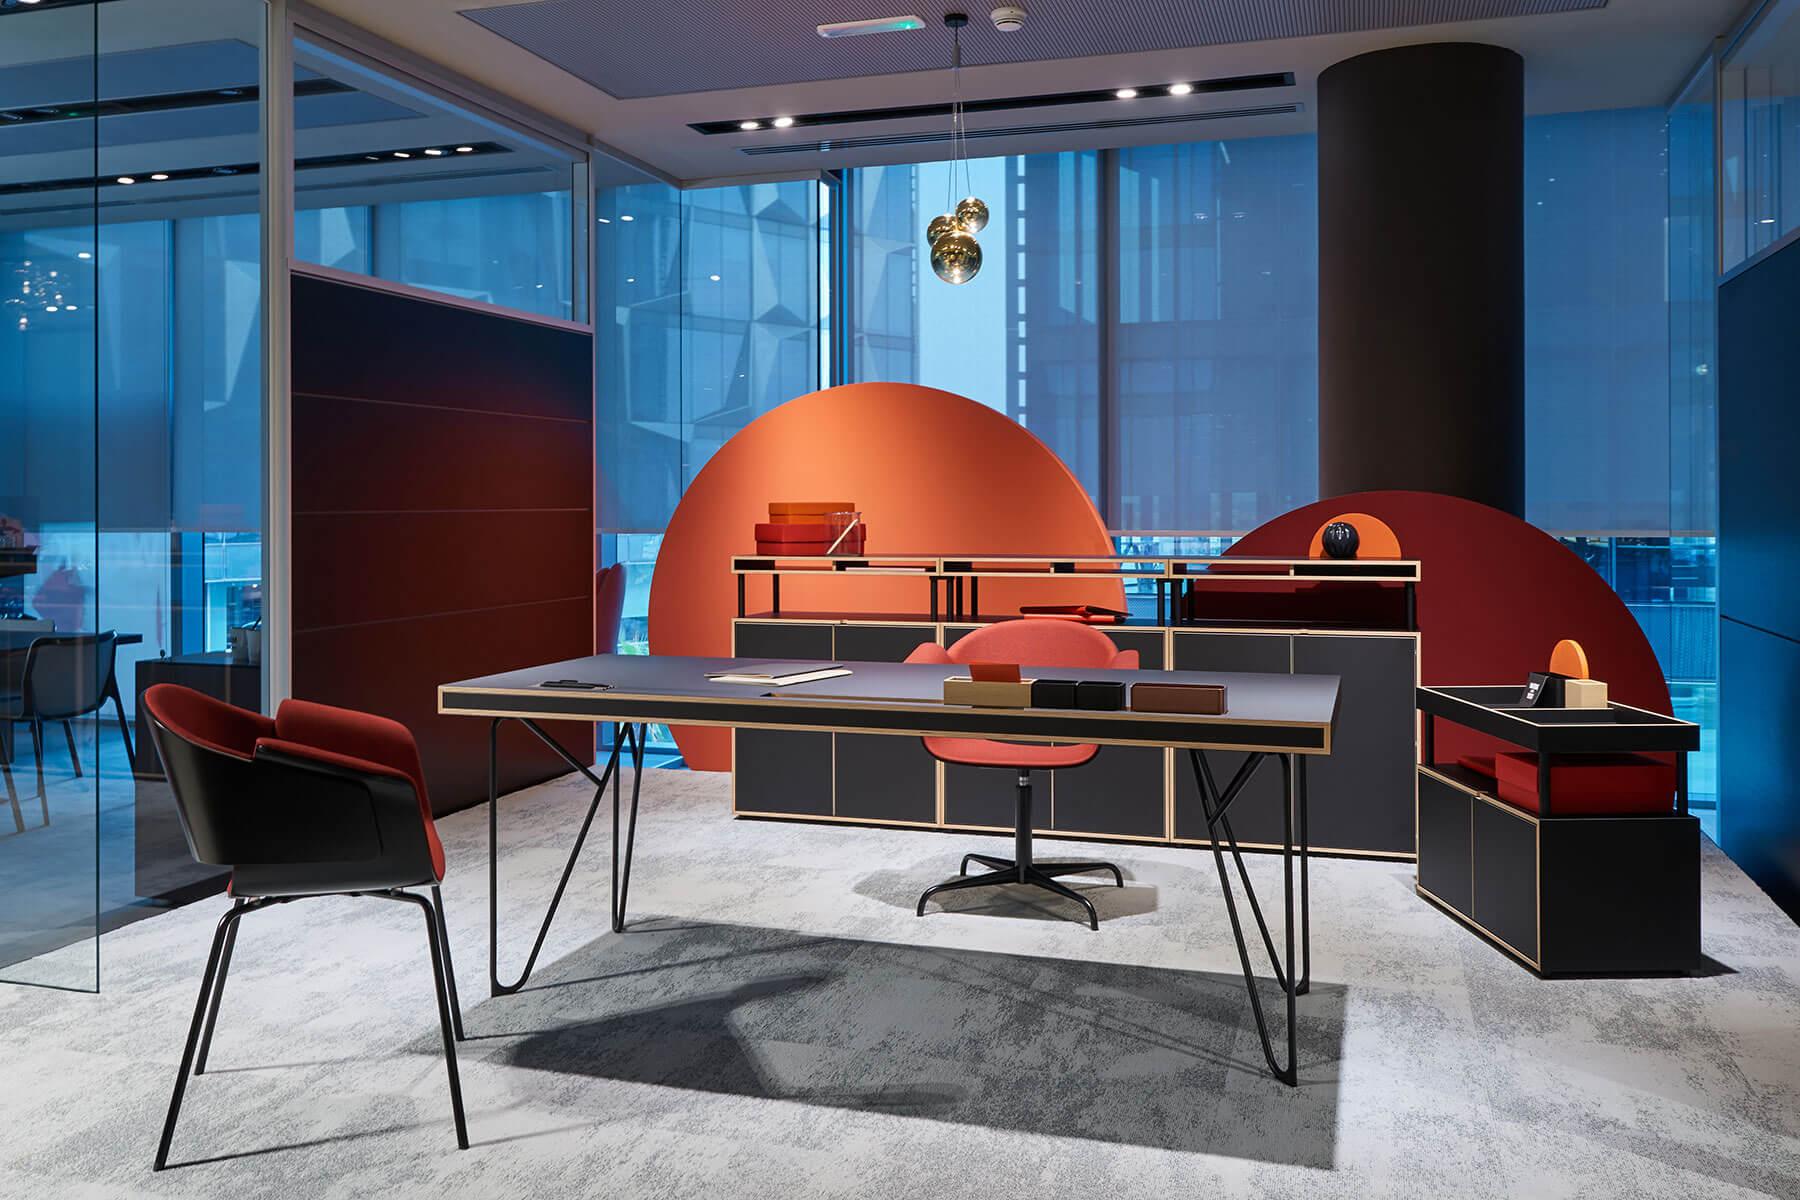 Office A2Z Office Furniture, Dubai – UAE